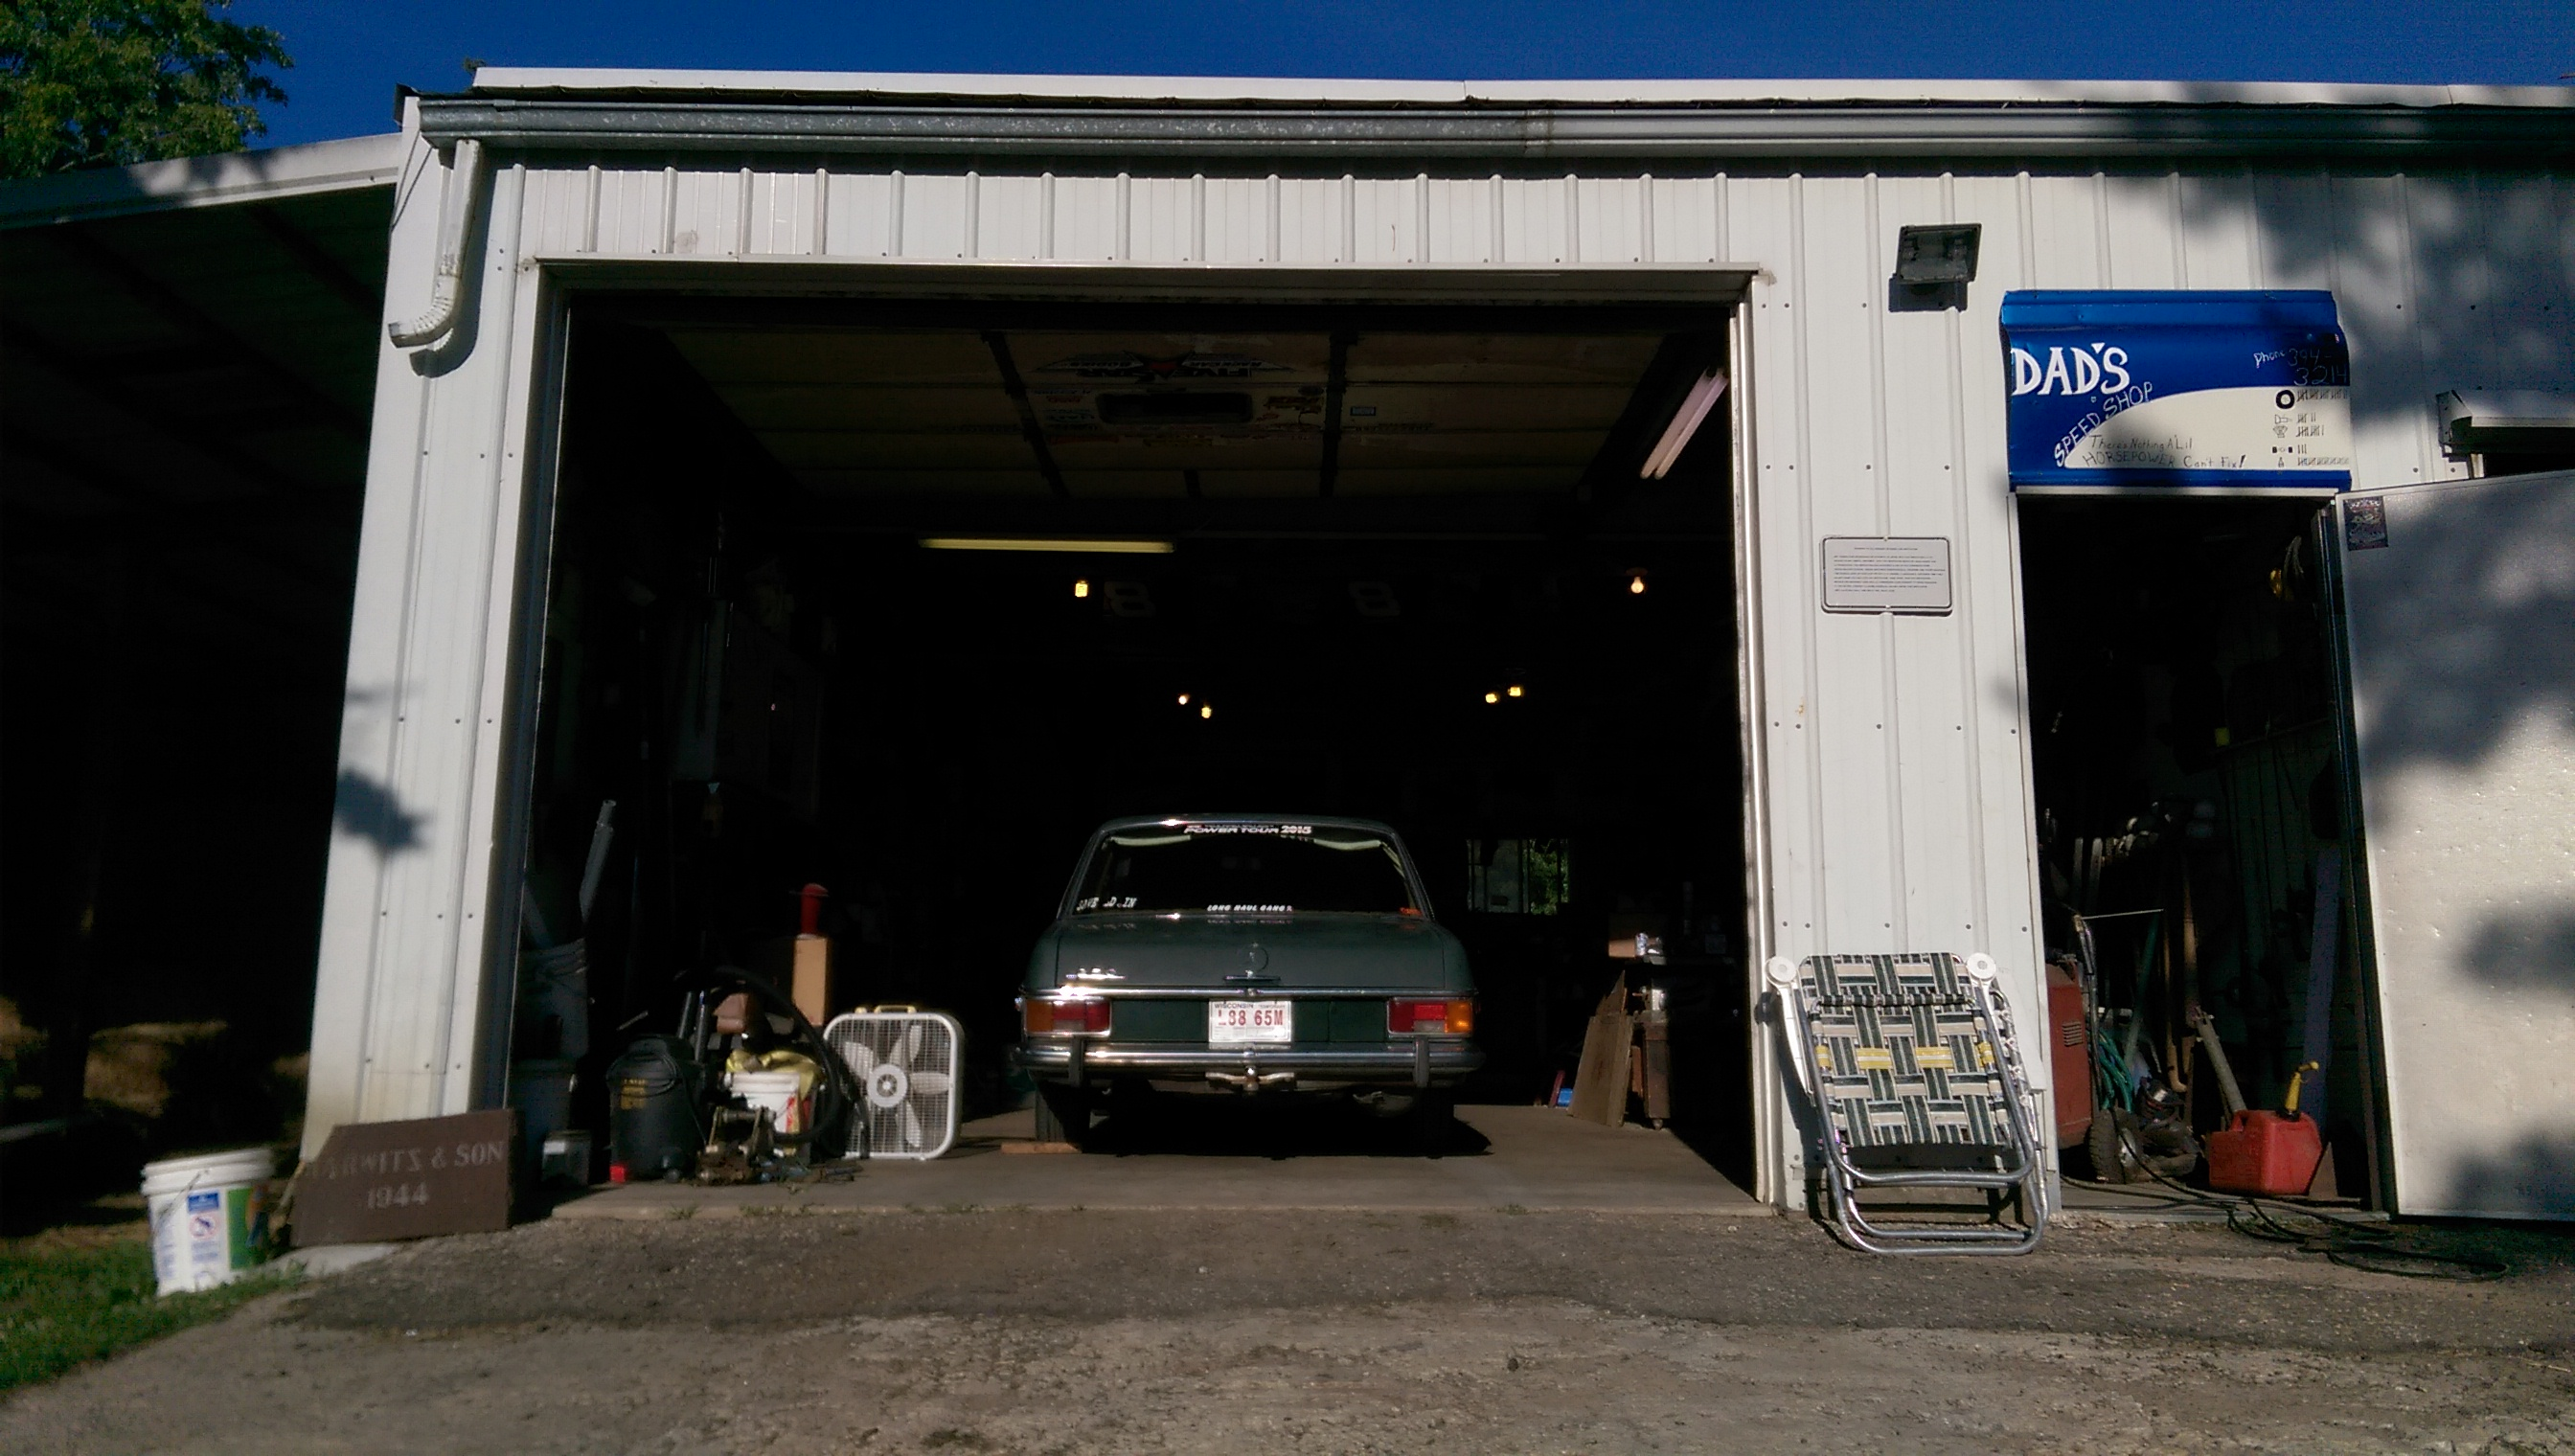 garageTime